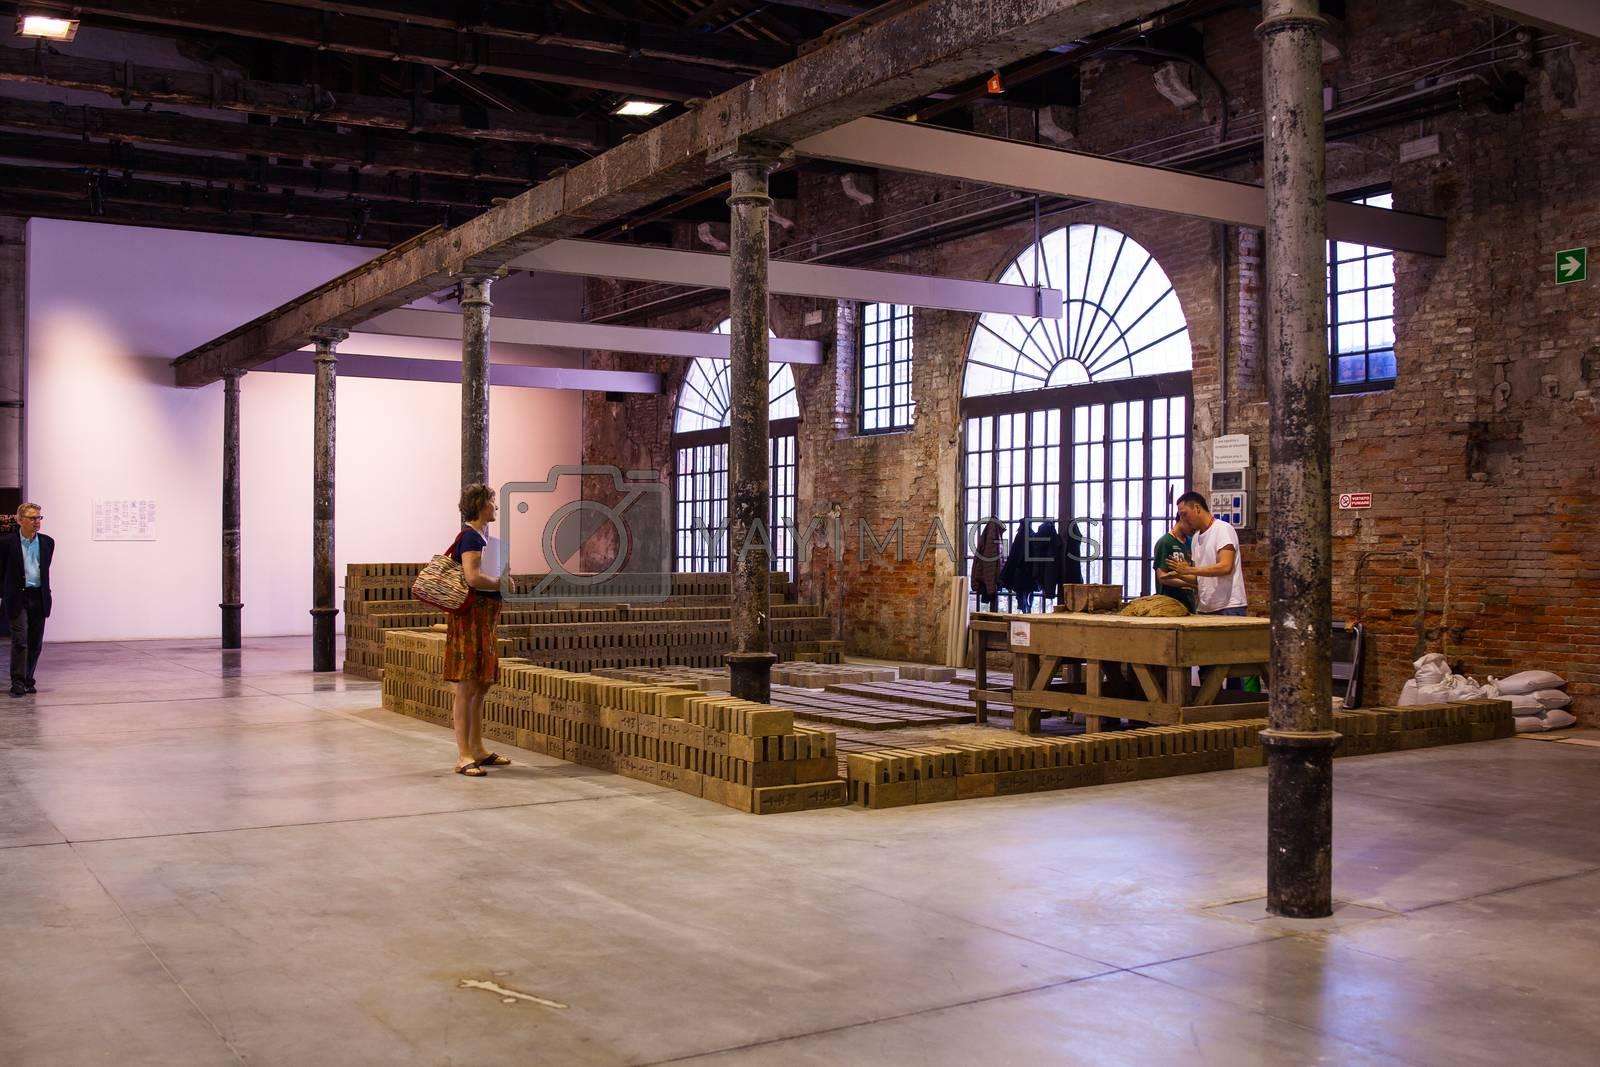 Rirkrit Tiravanija installation, Arsenale. 56th Venice biennale by bepsimage